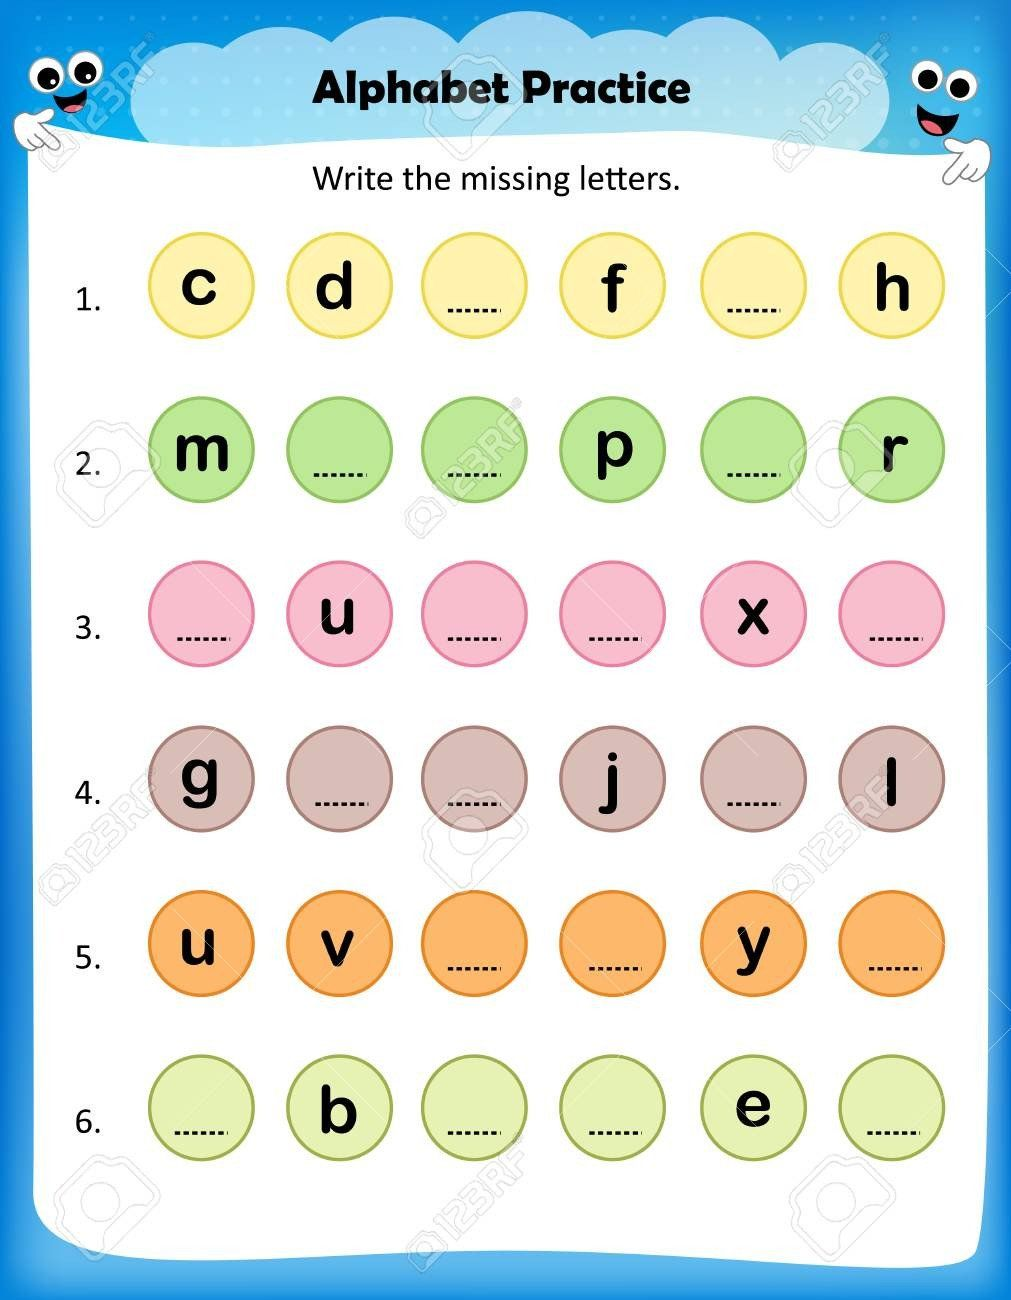 Missing Alphabet Letters Worksheet Worksheet Write The Missing Alphabet Letters In The R Letter Worksheets Missing Letter Worksheets Alphabet Letter Worksheets Write missing letter worksheet